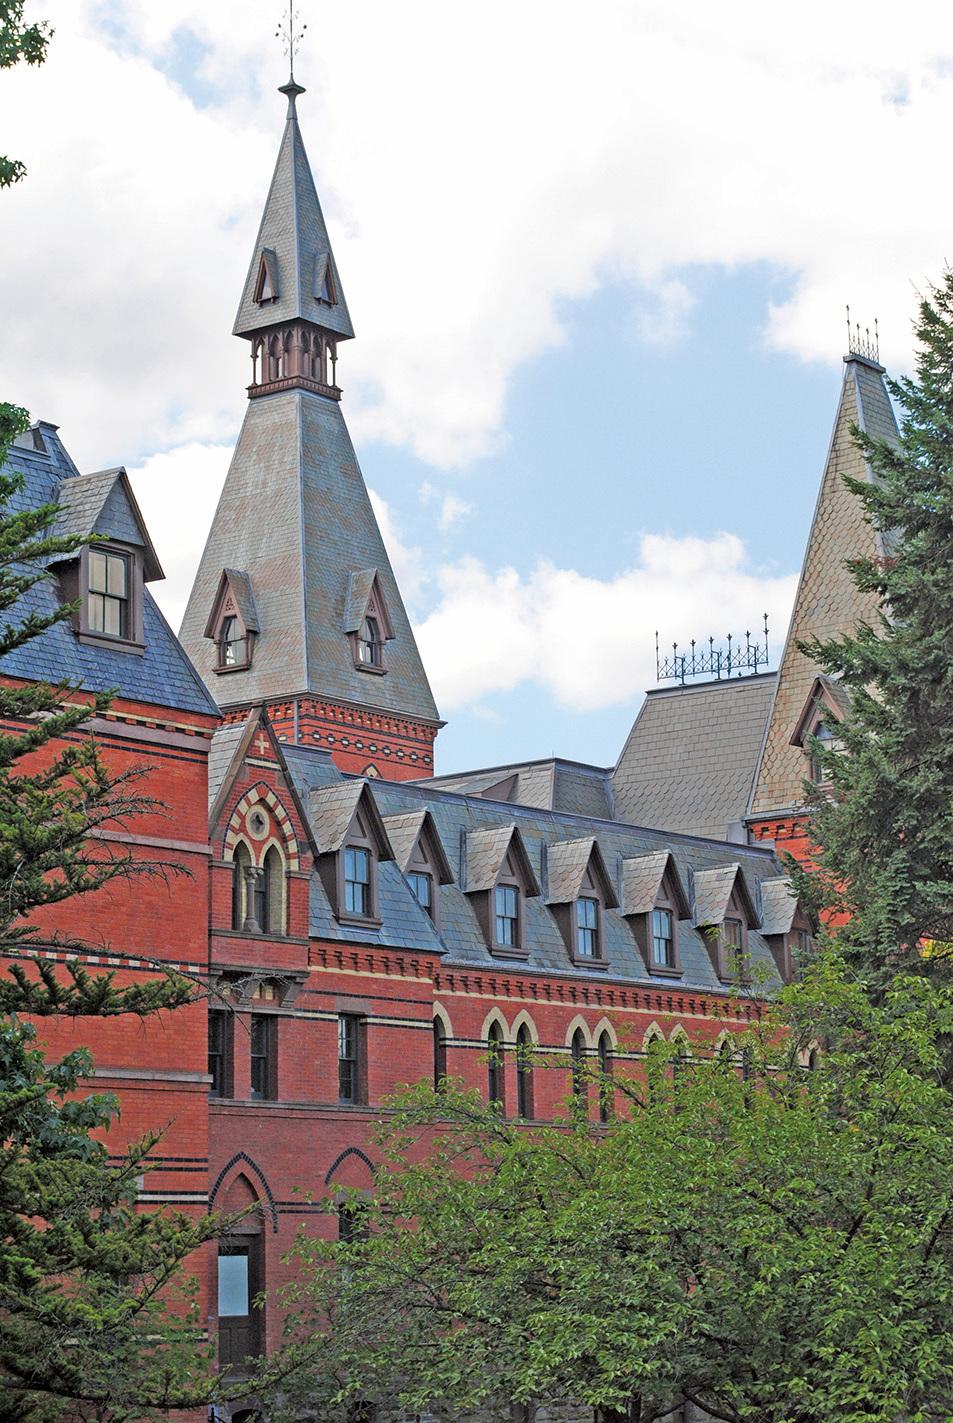 康奈爾大學S·C·約翰遜管理研究院(Eustress/Wikimedia Commons)